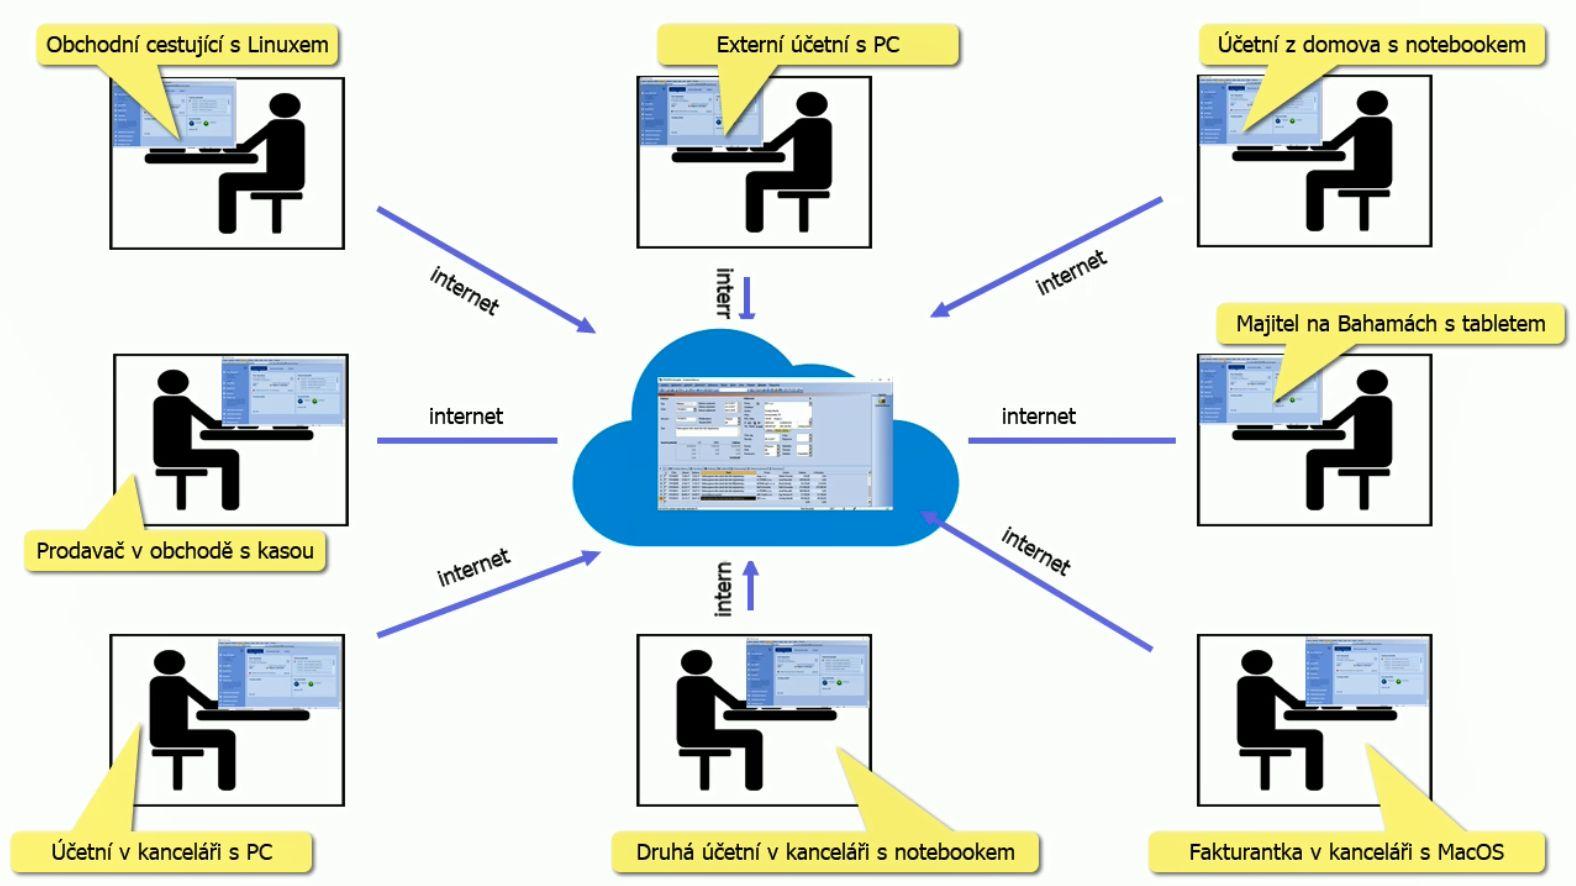 Pohoda nebo Money S3 v cloudu